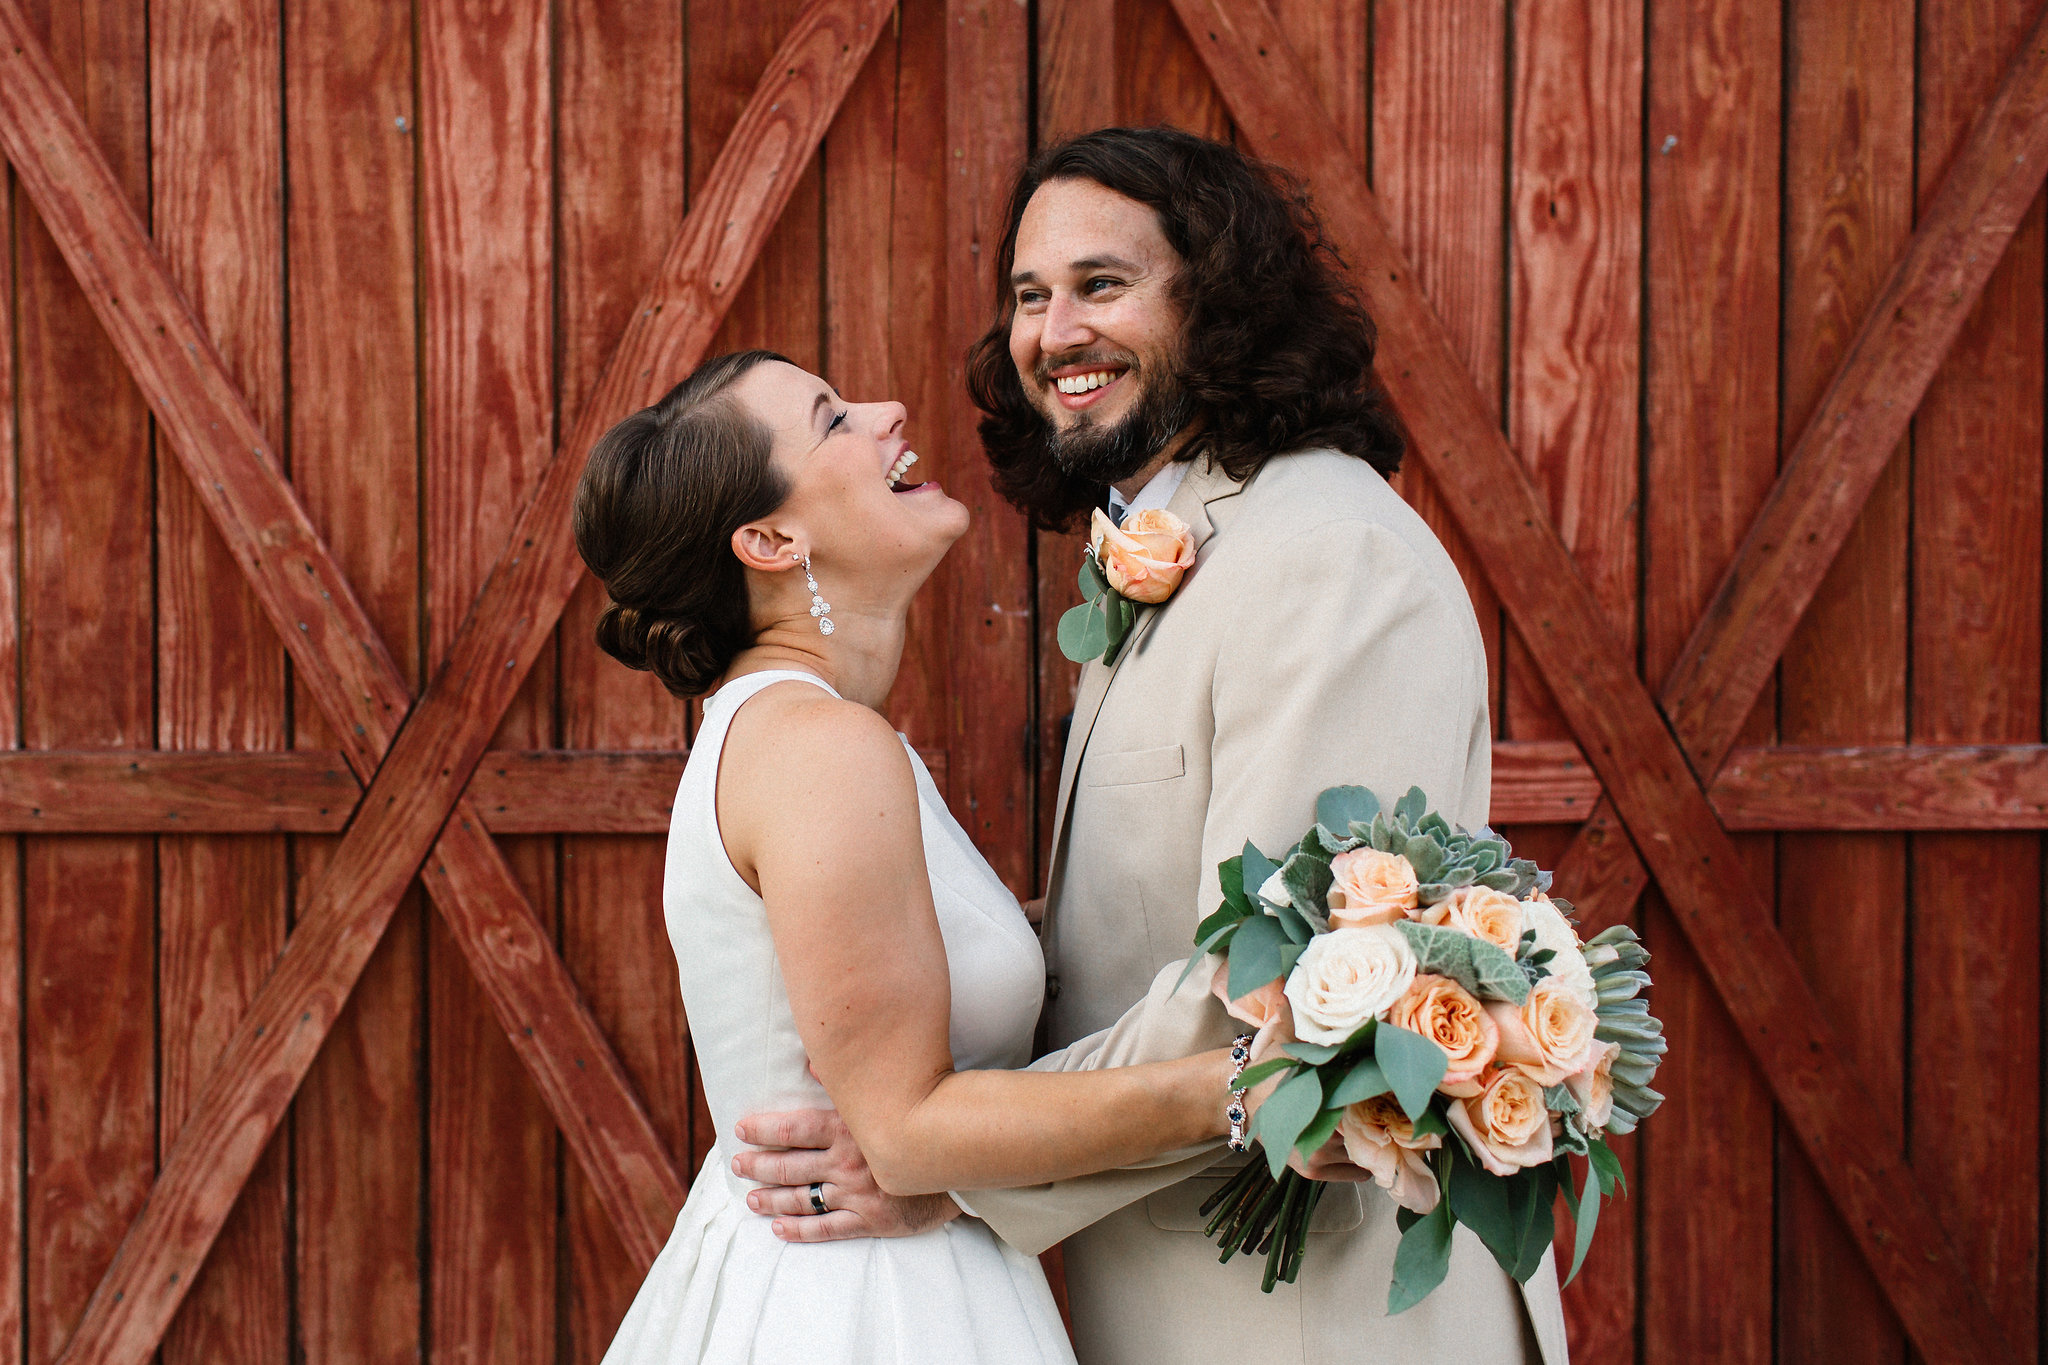 Lindsay&JoshMarried2017-08-31at19.08.10PM153.jpg